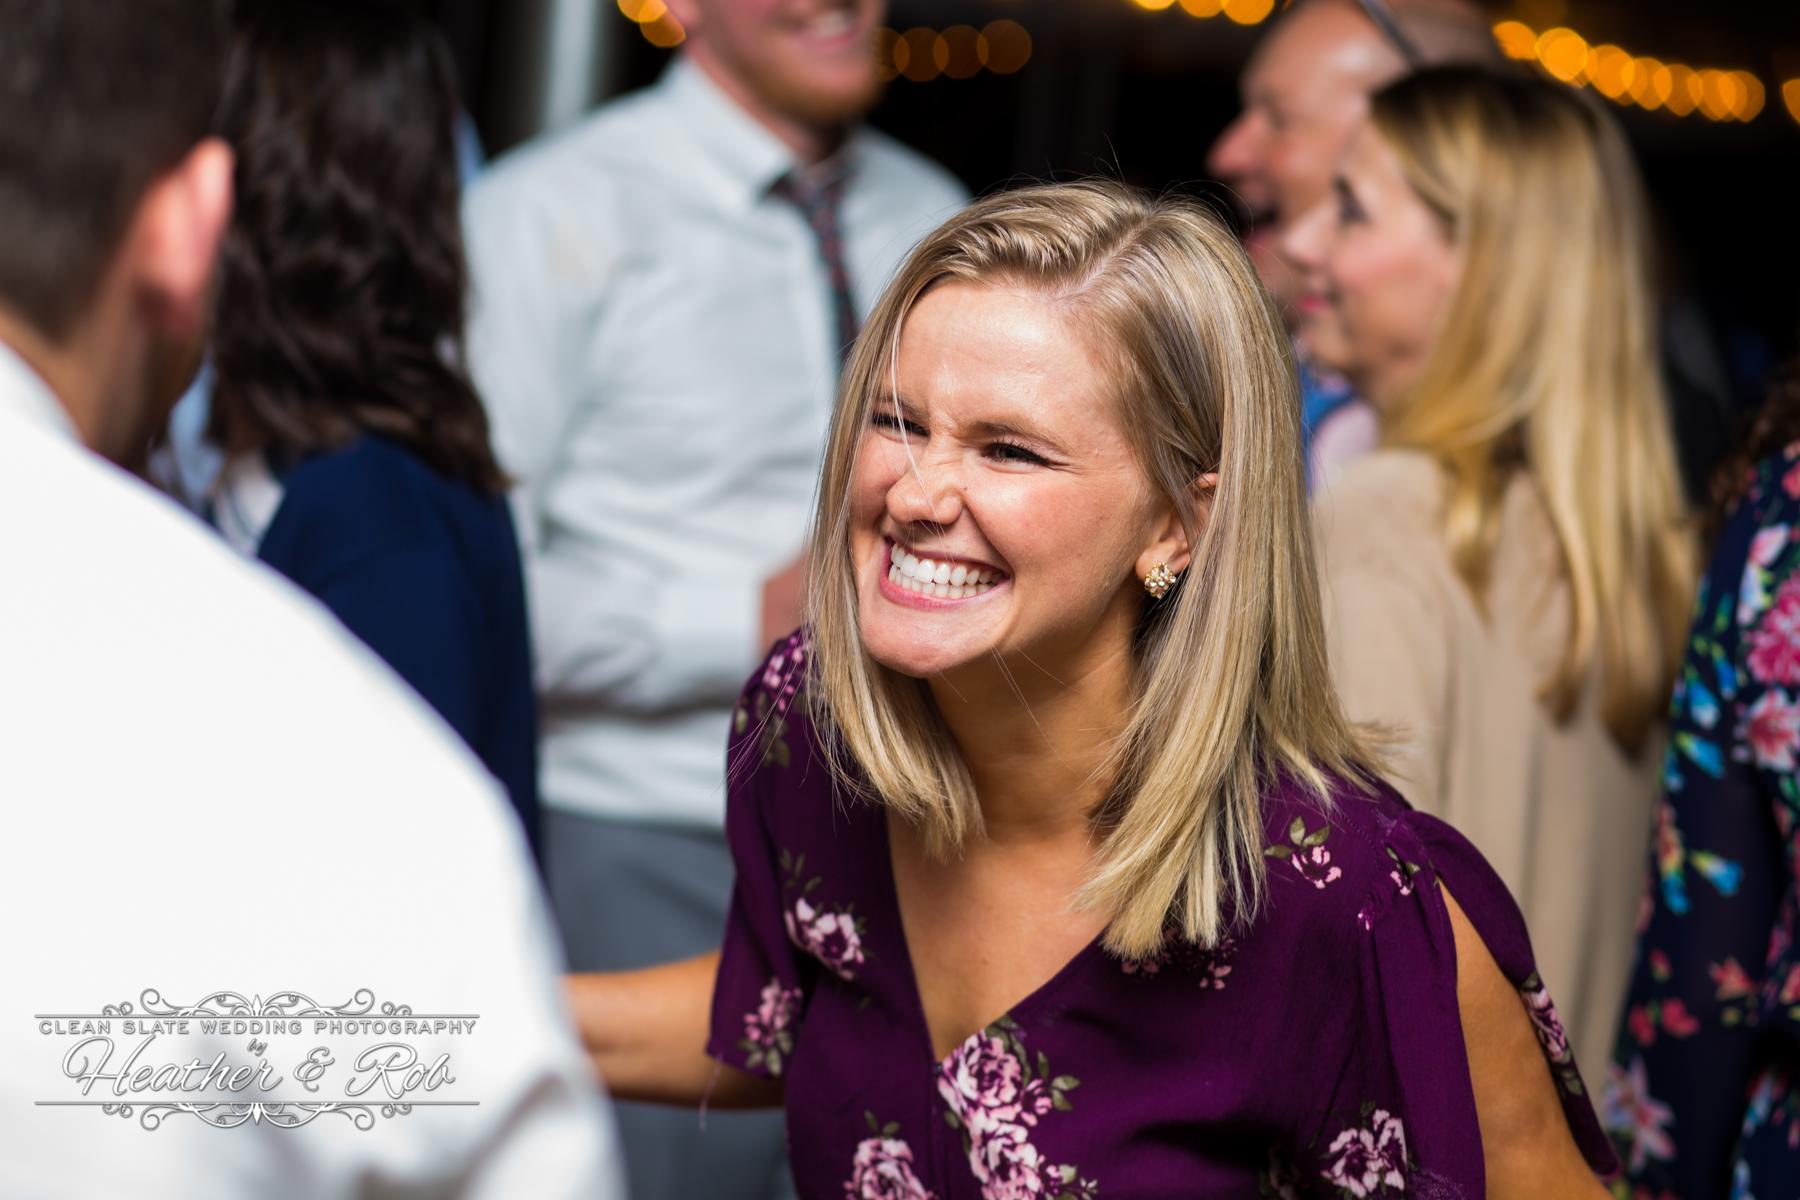 woman smiling while dancing at wedding